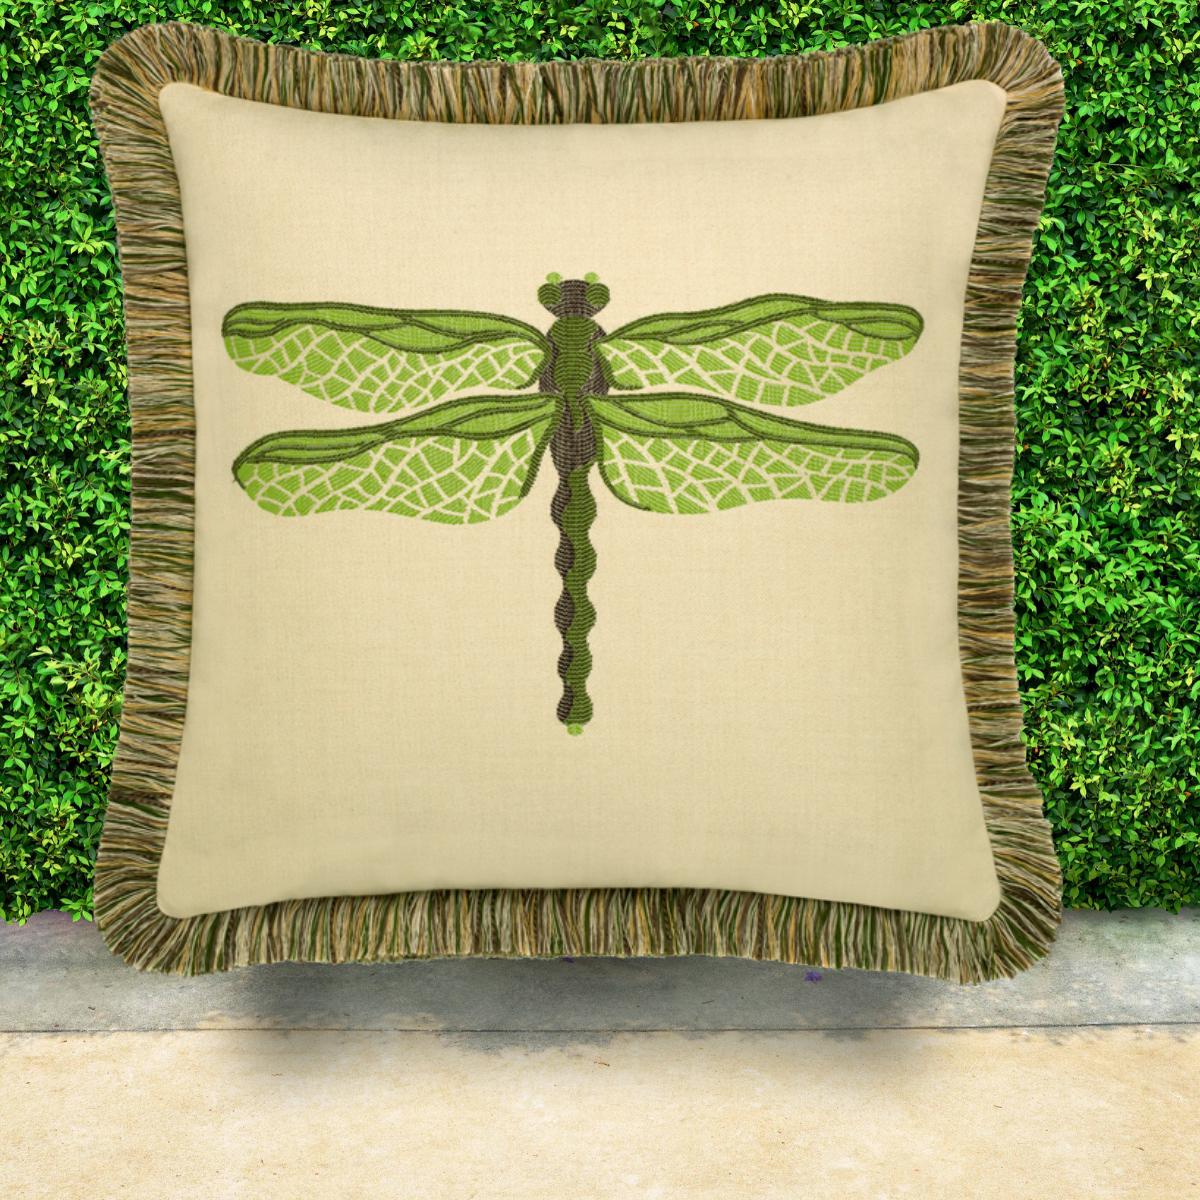 elaine-smith-sunbrella-dragonfly-pillow-peridot